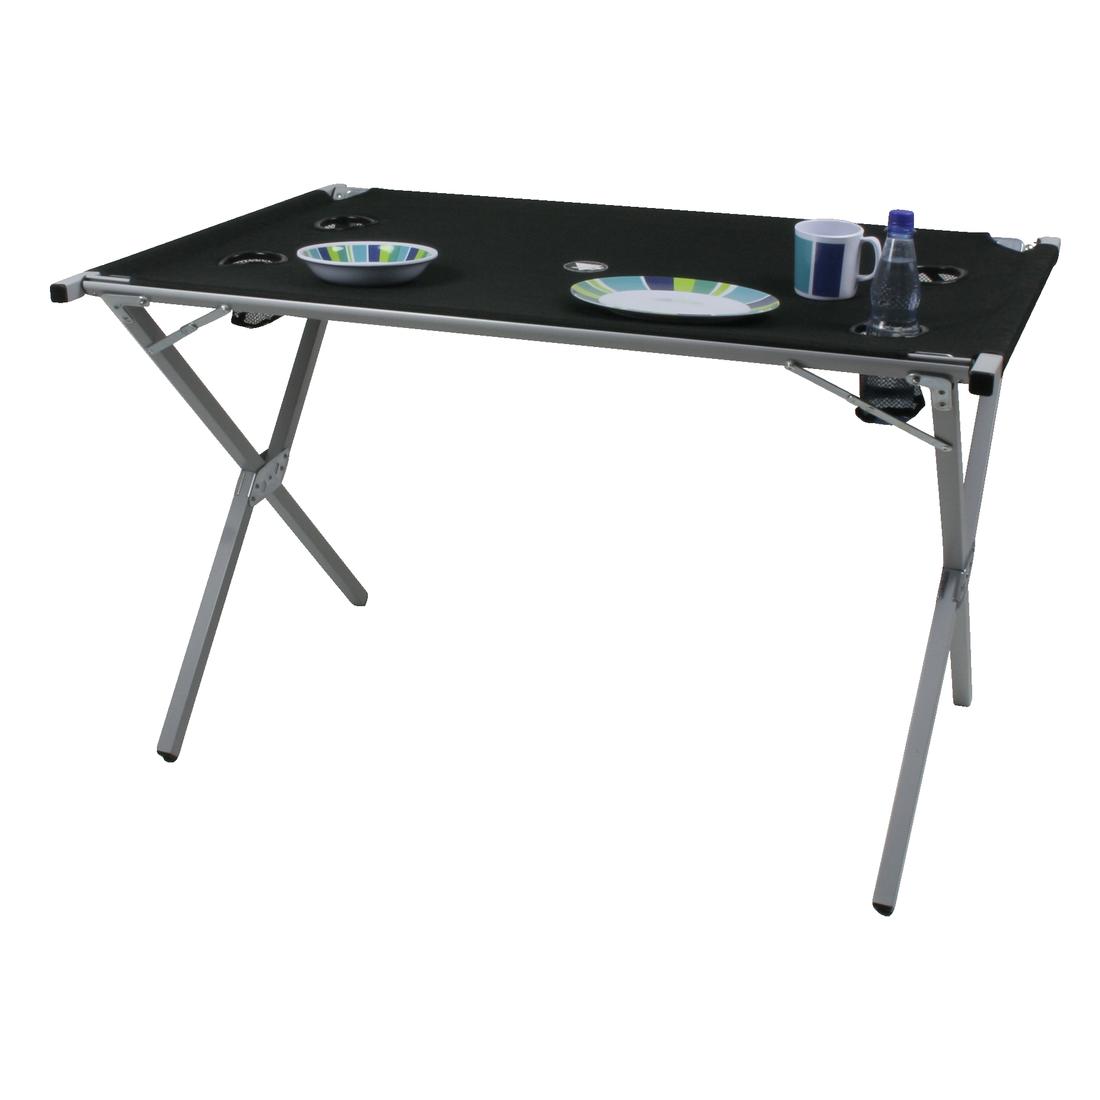 10t polytab double mobiler camping tisch mit tuchoberf che 110x70cm in handlic ebay. Black Bedroom Furniture Sets. Home Design Ideas